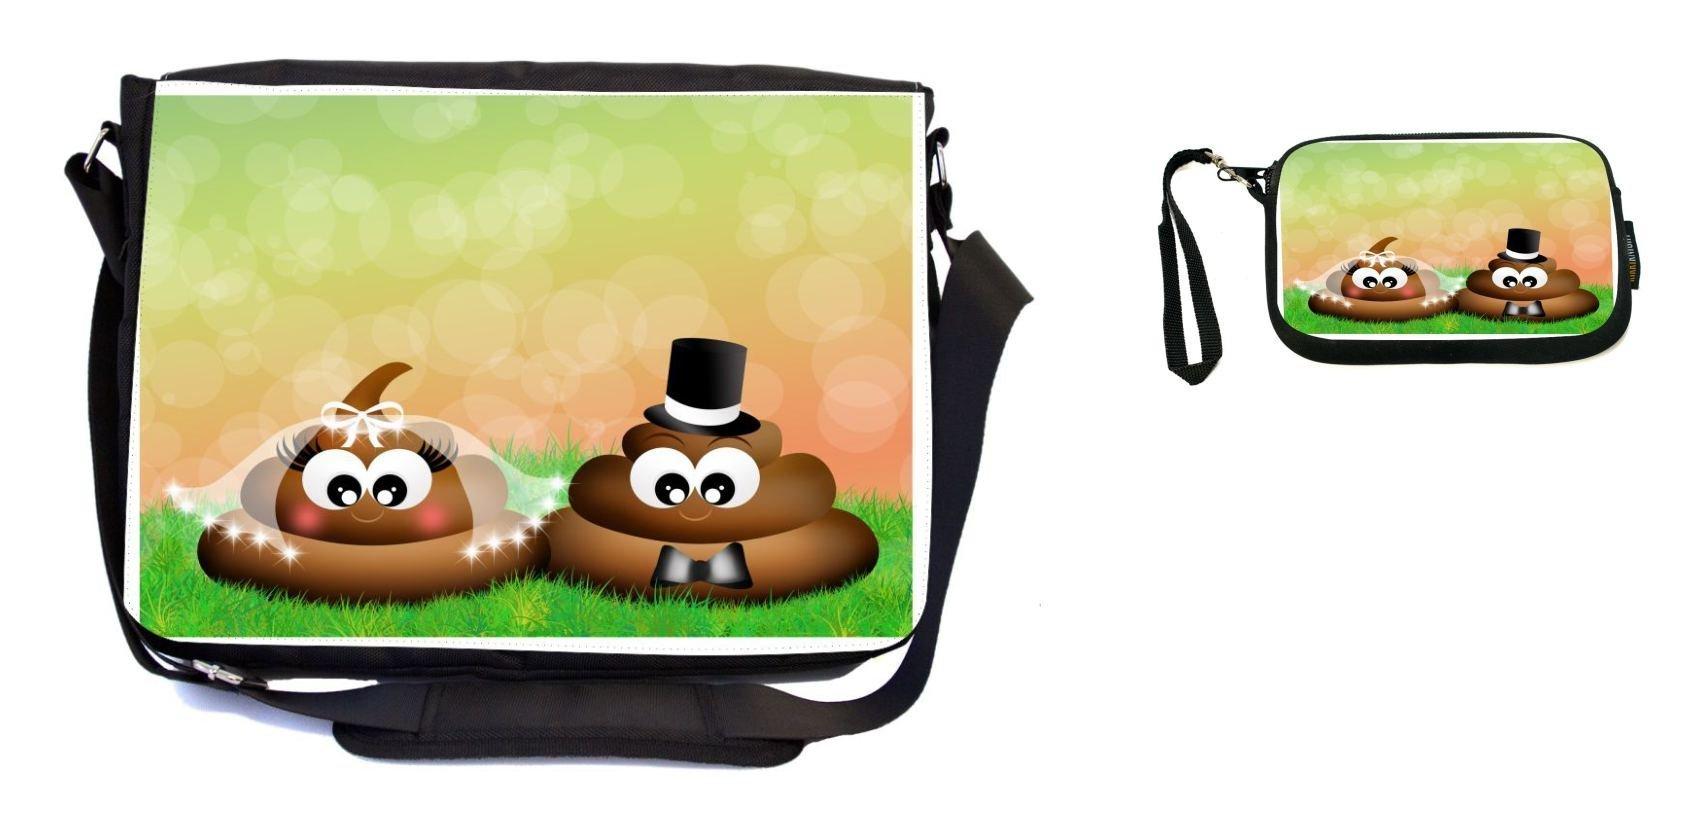 Rikki Knight Stinky Poop in Love Wedding Illustration Design Messenger Bag - School Bag - Laptop Bag - with Padded Insert - Includes UKBK Premium Coin Purse